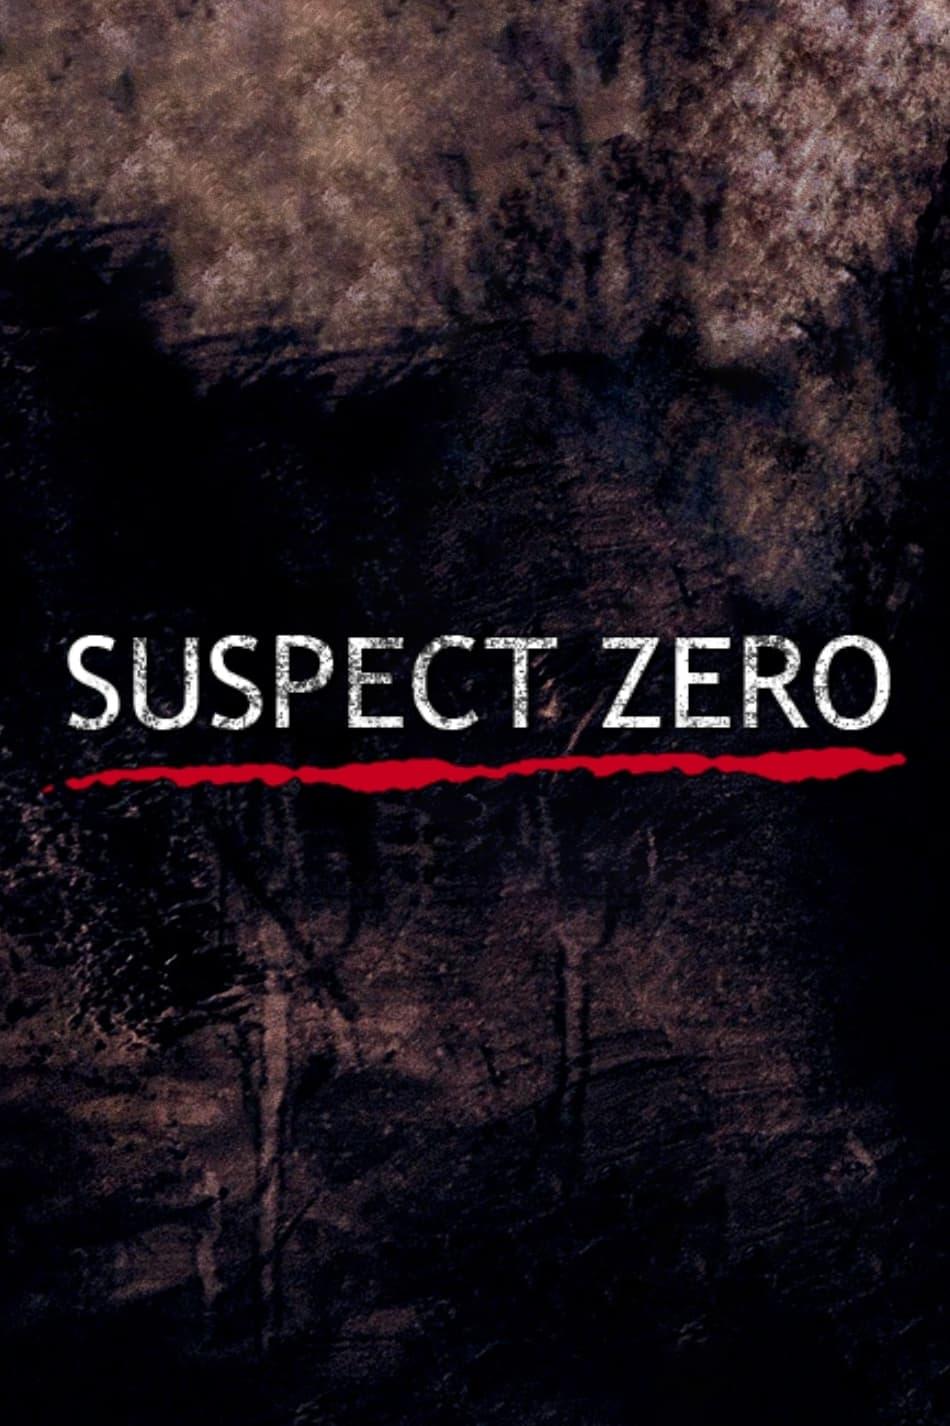 O Suspeito Zero